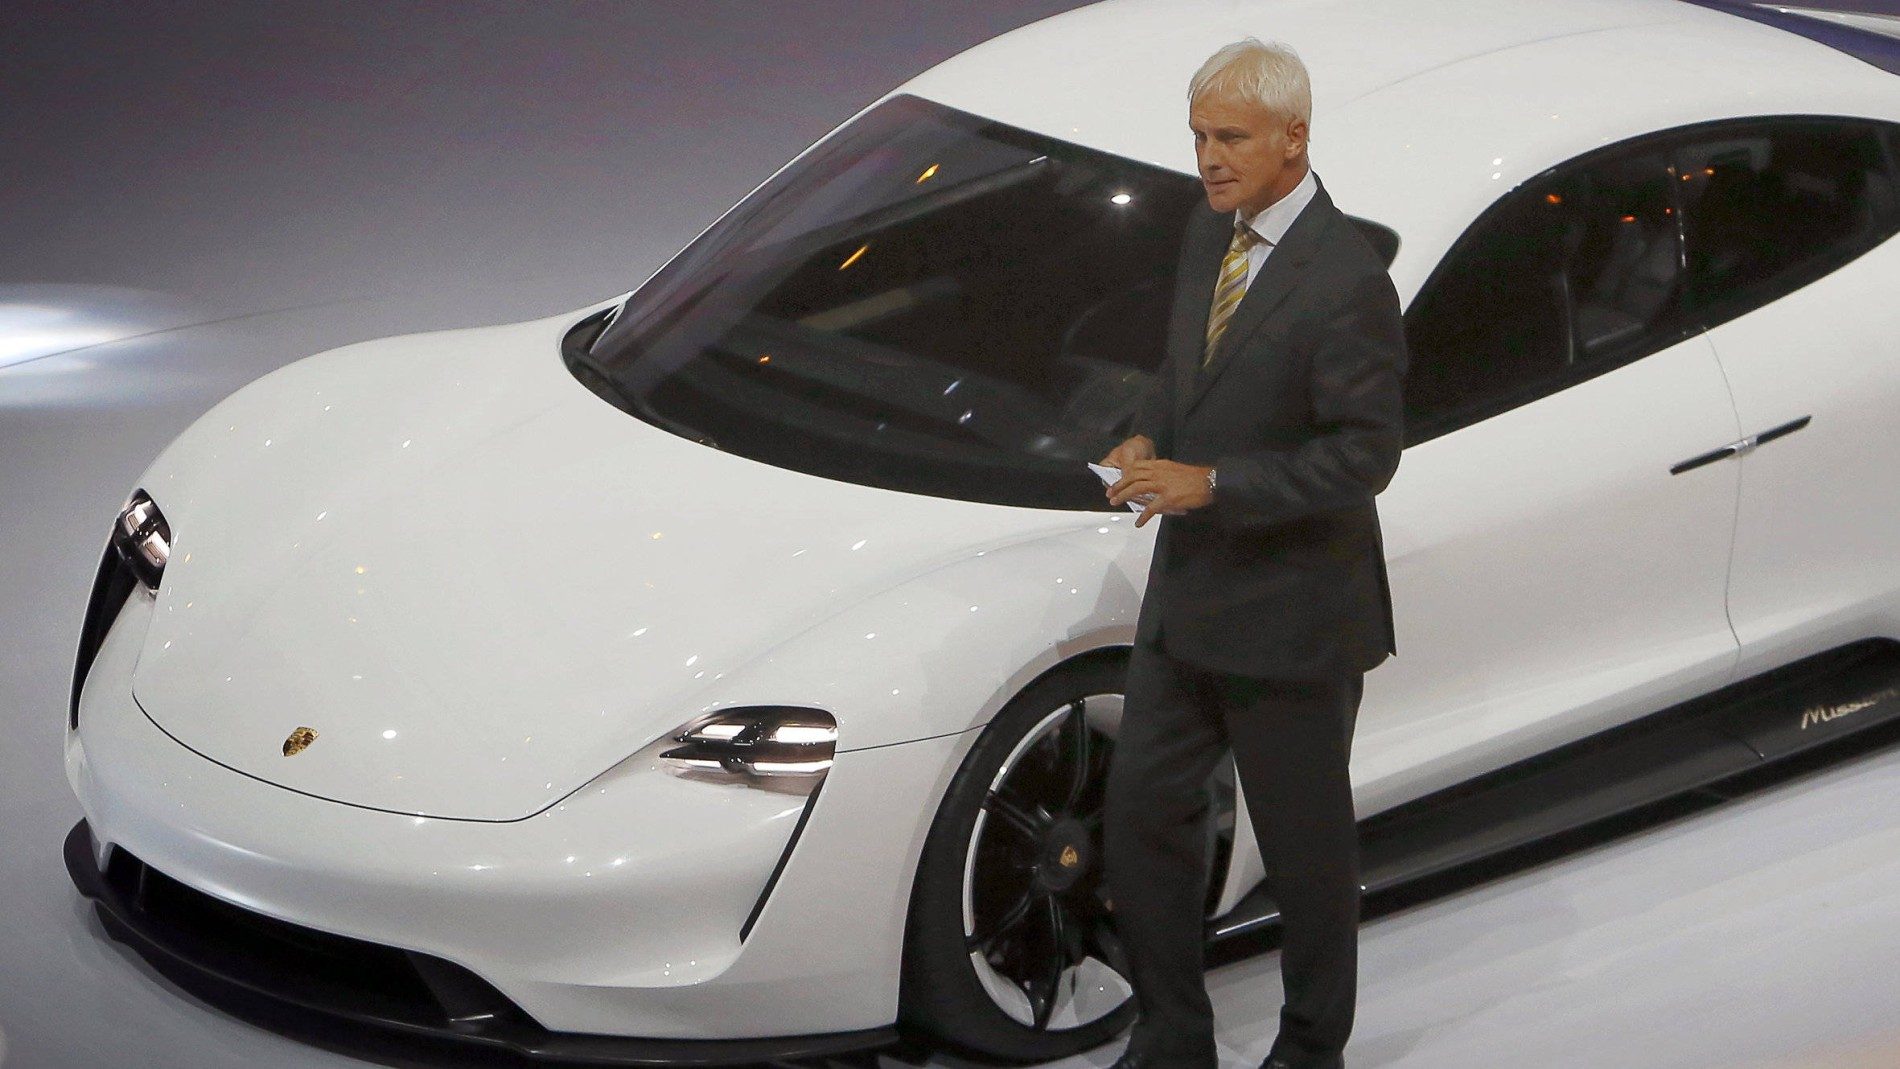 Abgasskandal: VW-Beschäftigte wollen Zeche nicht zahlen - Diesel ...